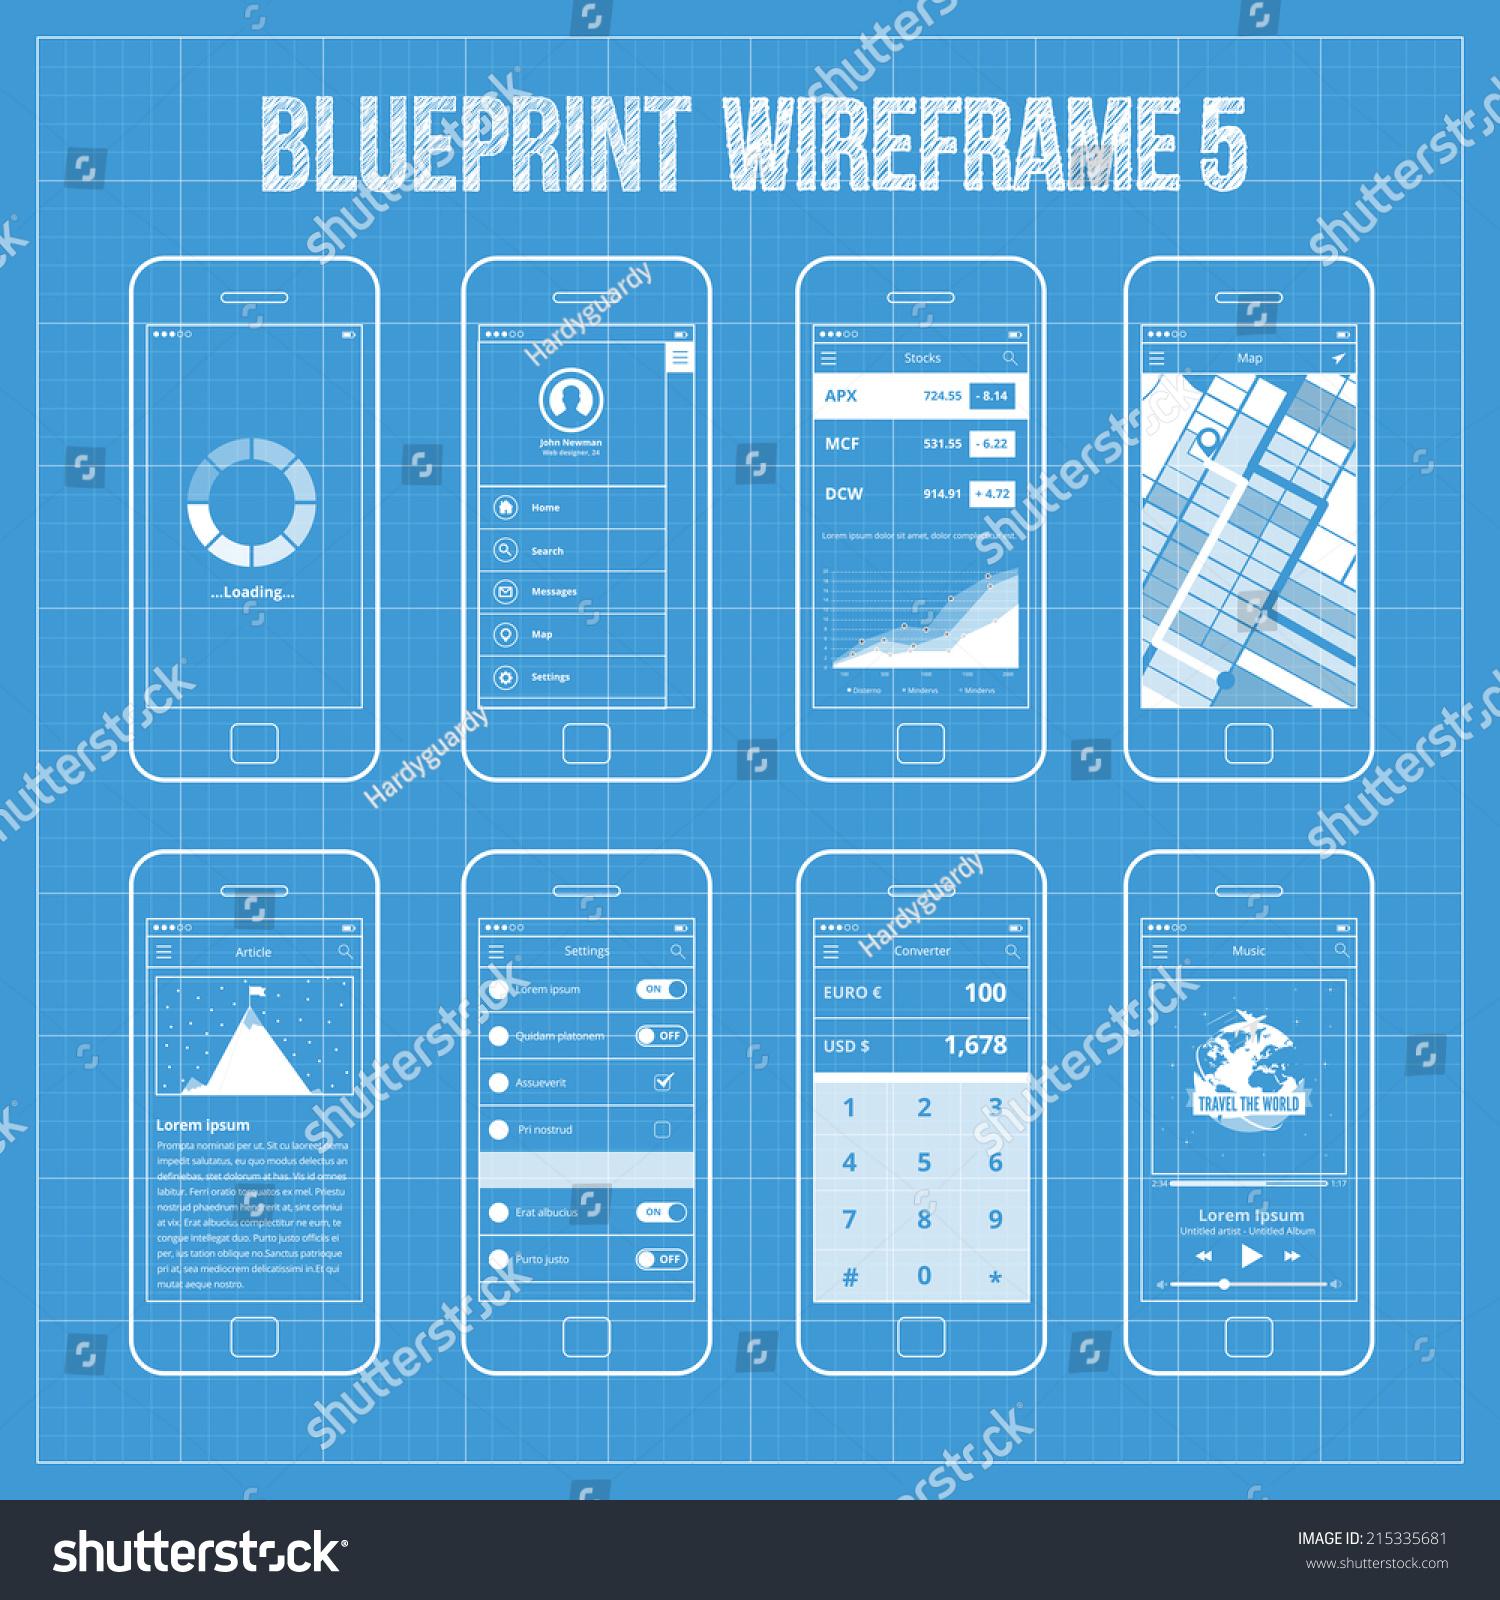 Blueprint wireframe mobile app ui kit stock vector for Convert image to blueprint online